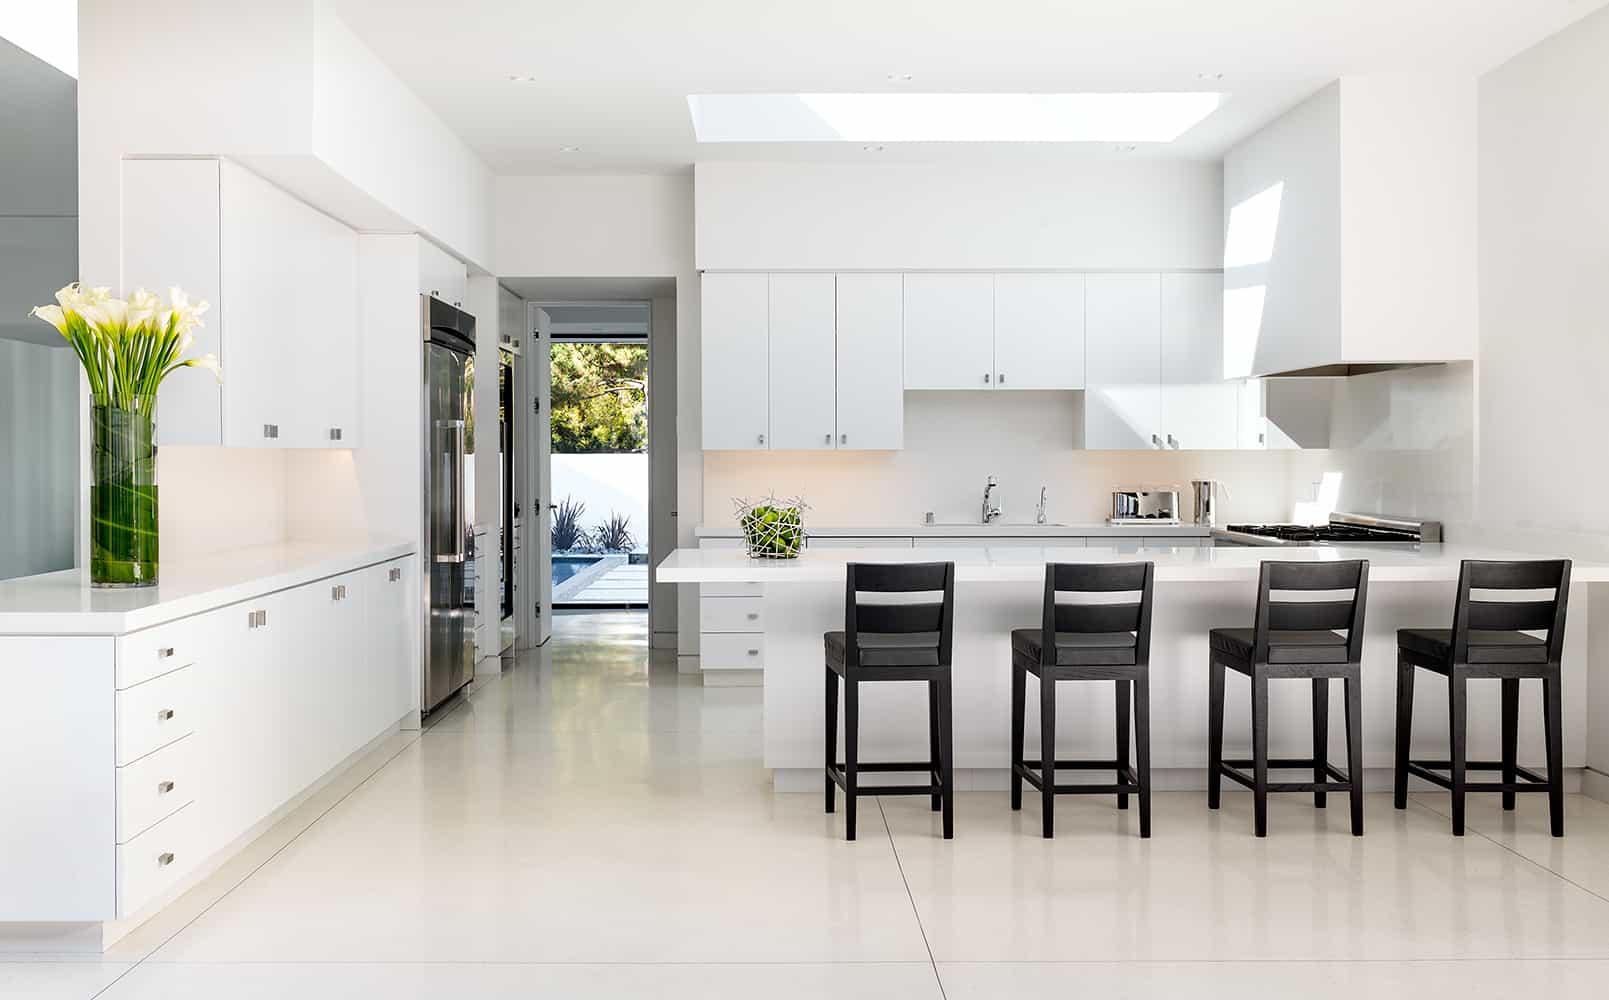 Modern-Home-Renovation-Belzberg Architects-08-1 Kindesign